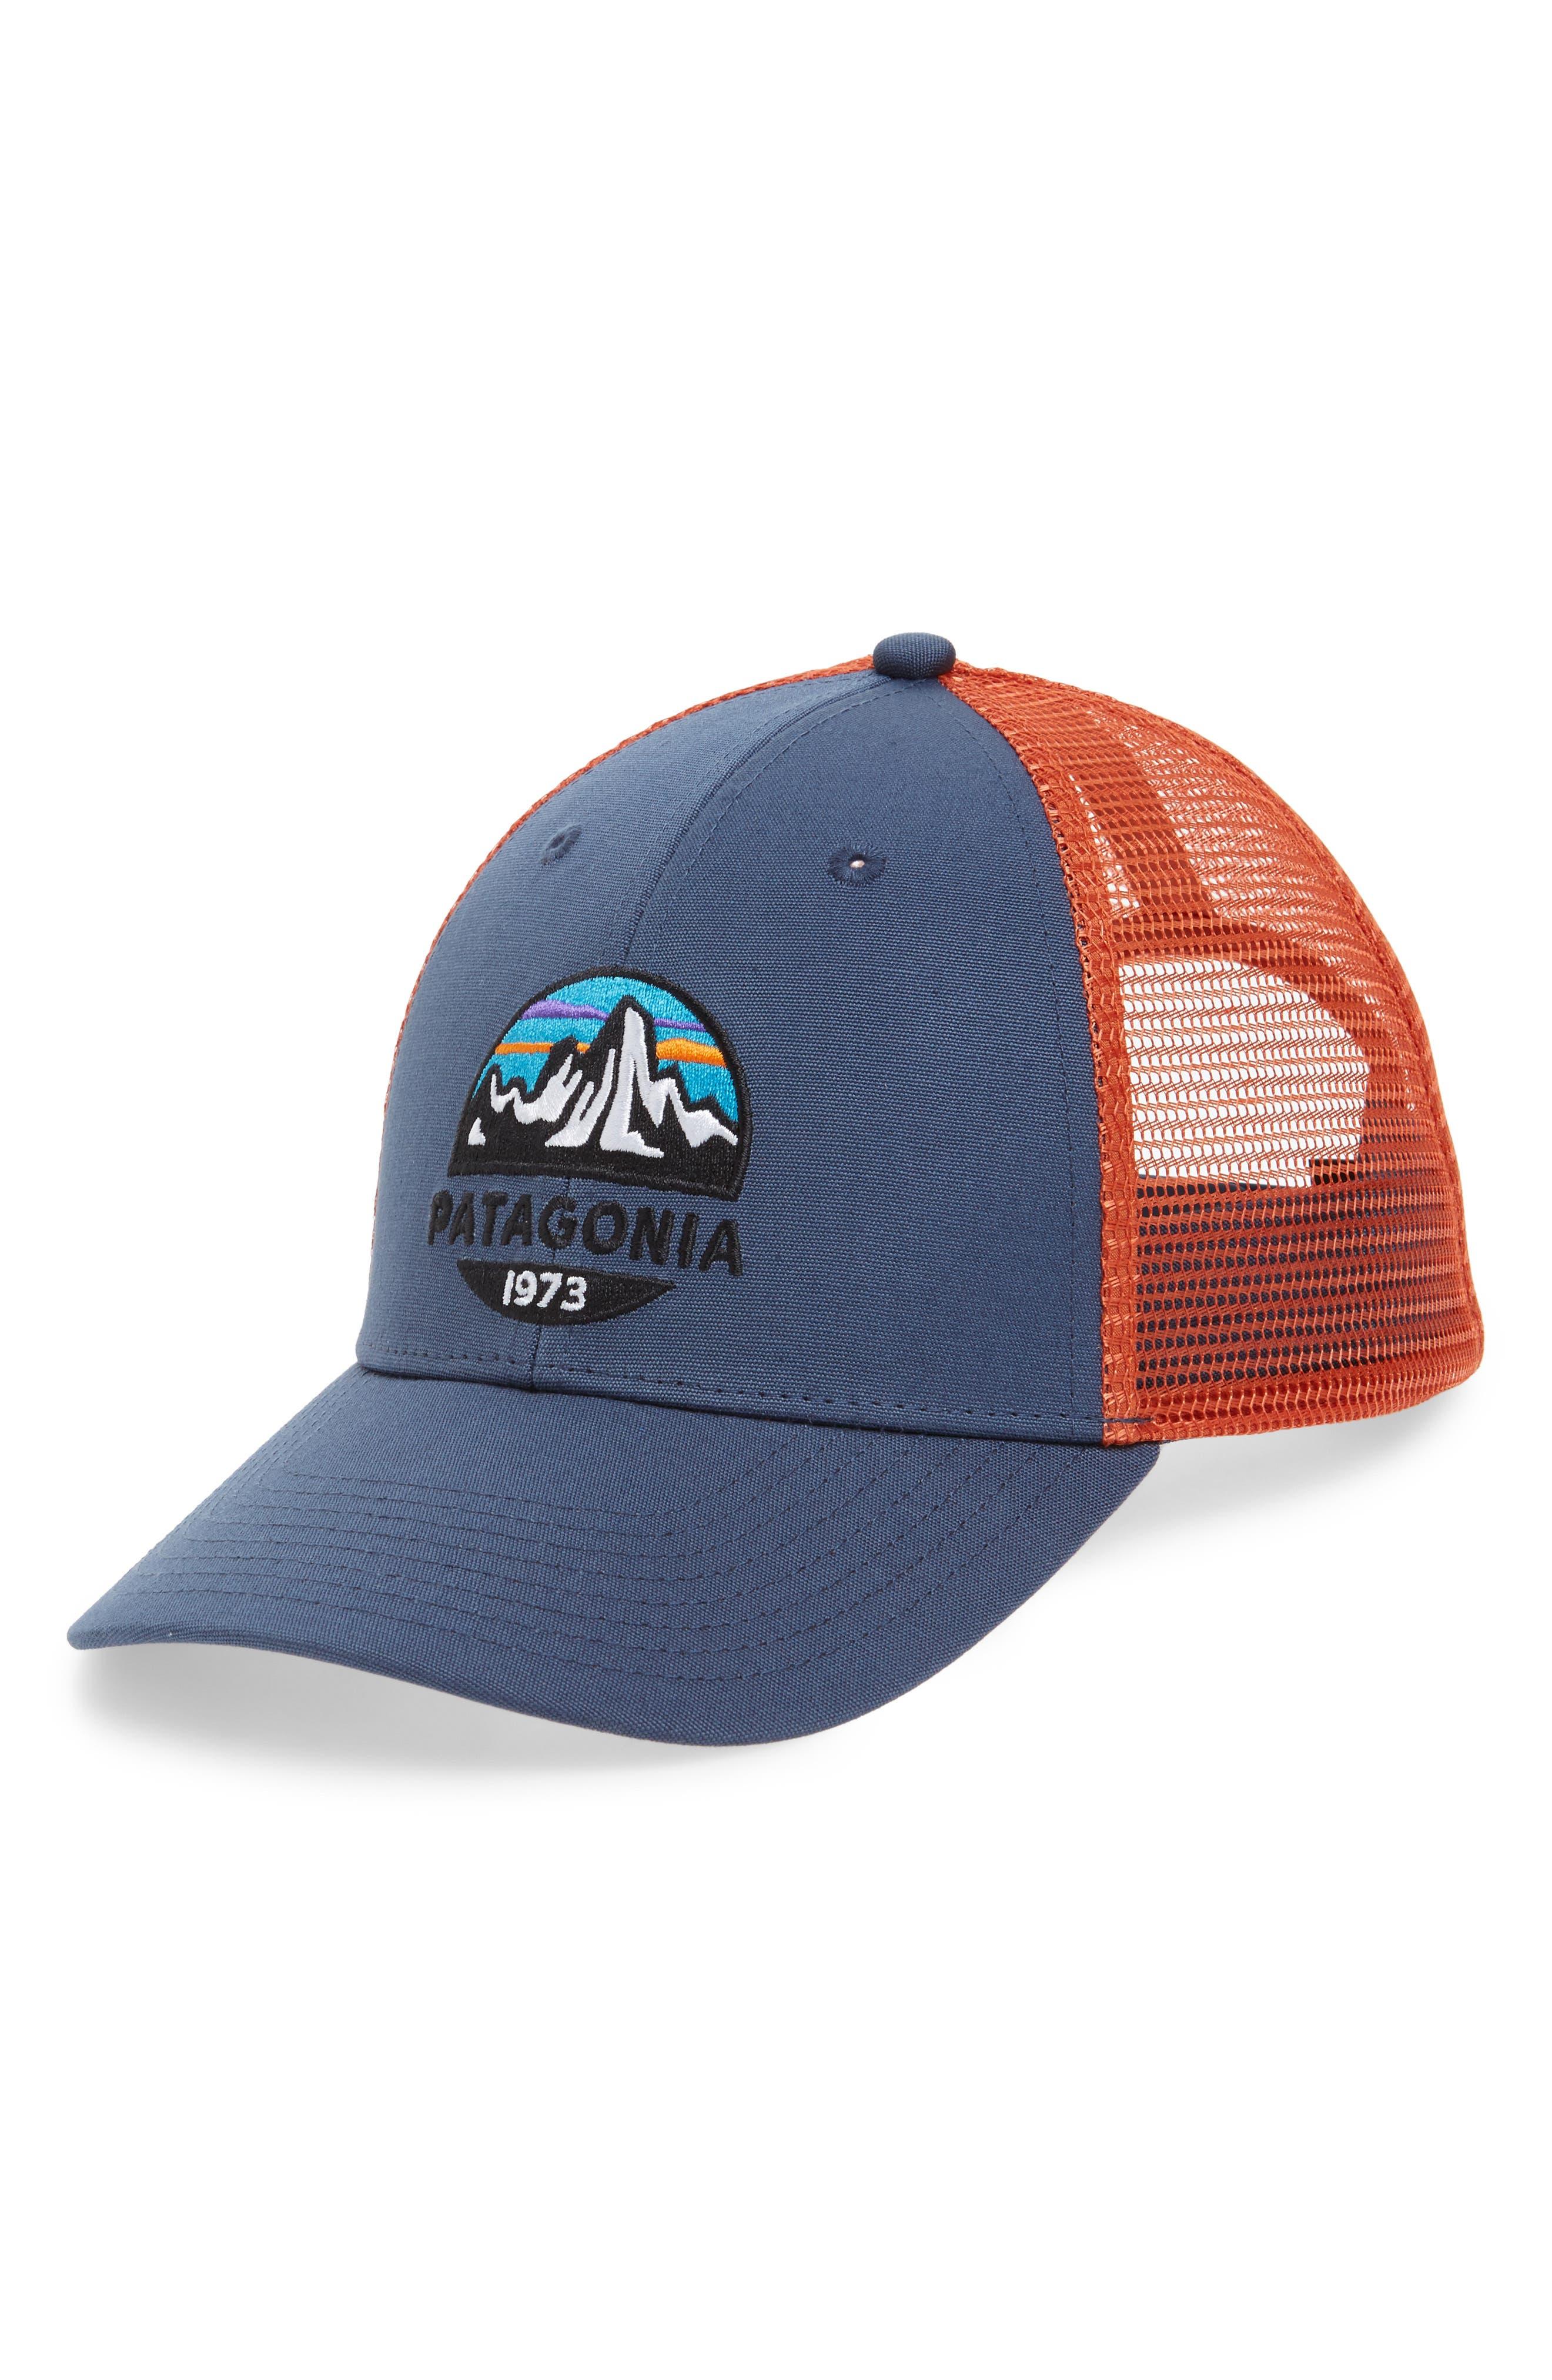 PATAGONIA Fitz Roy Scope Lopro Trucker Cap - Blue 3cc14d8241e